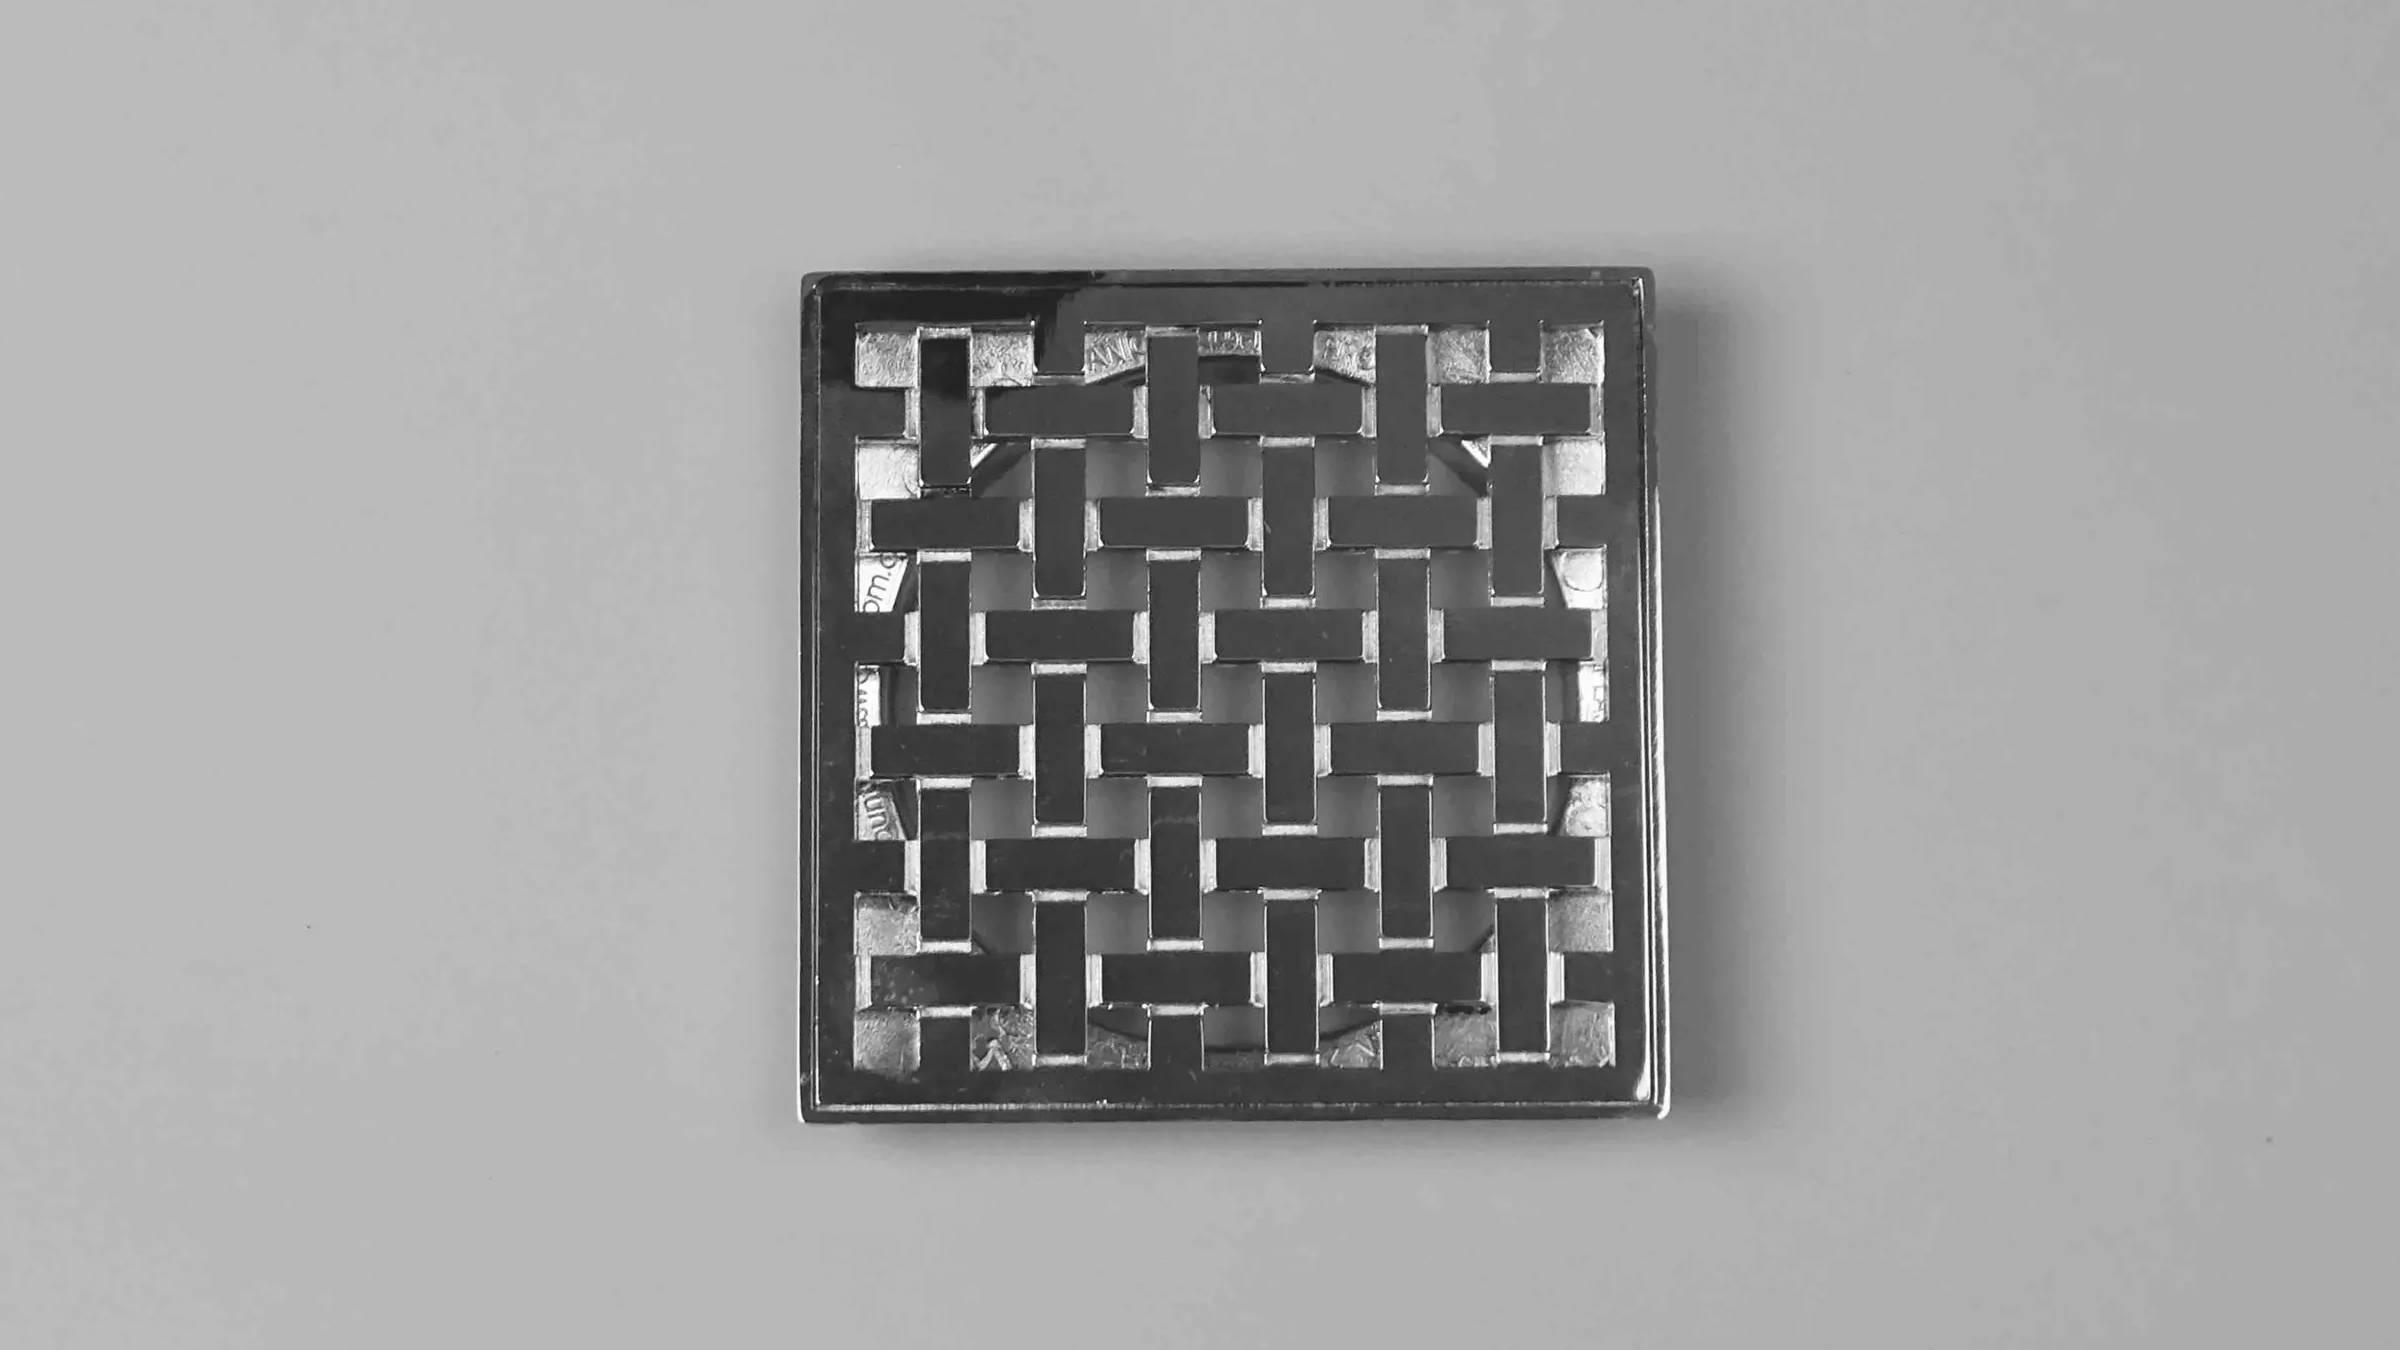 Woven Chrome Square Shower Drain Grate